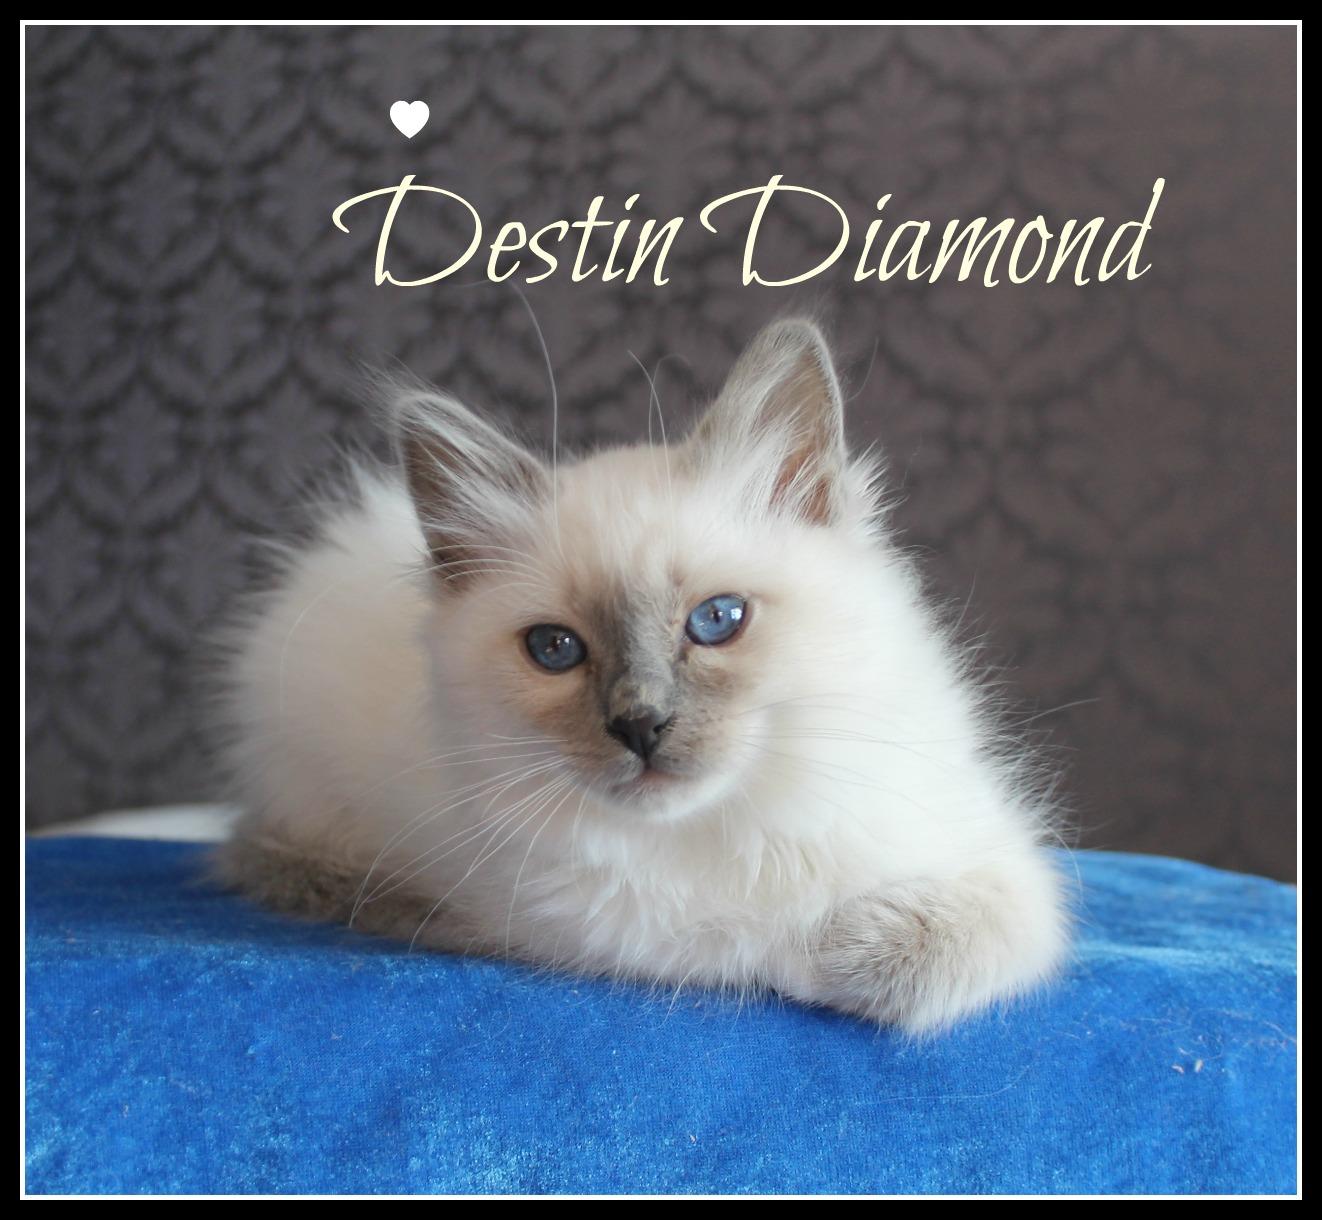 destin-2